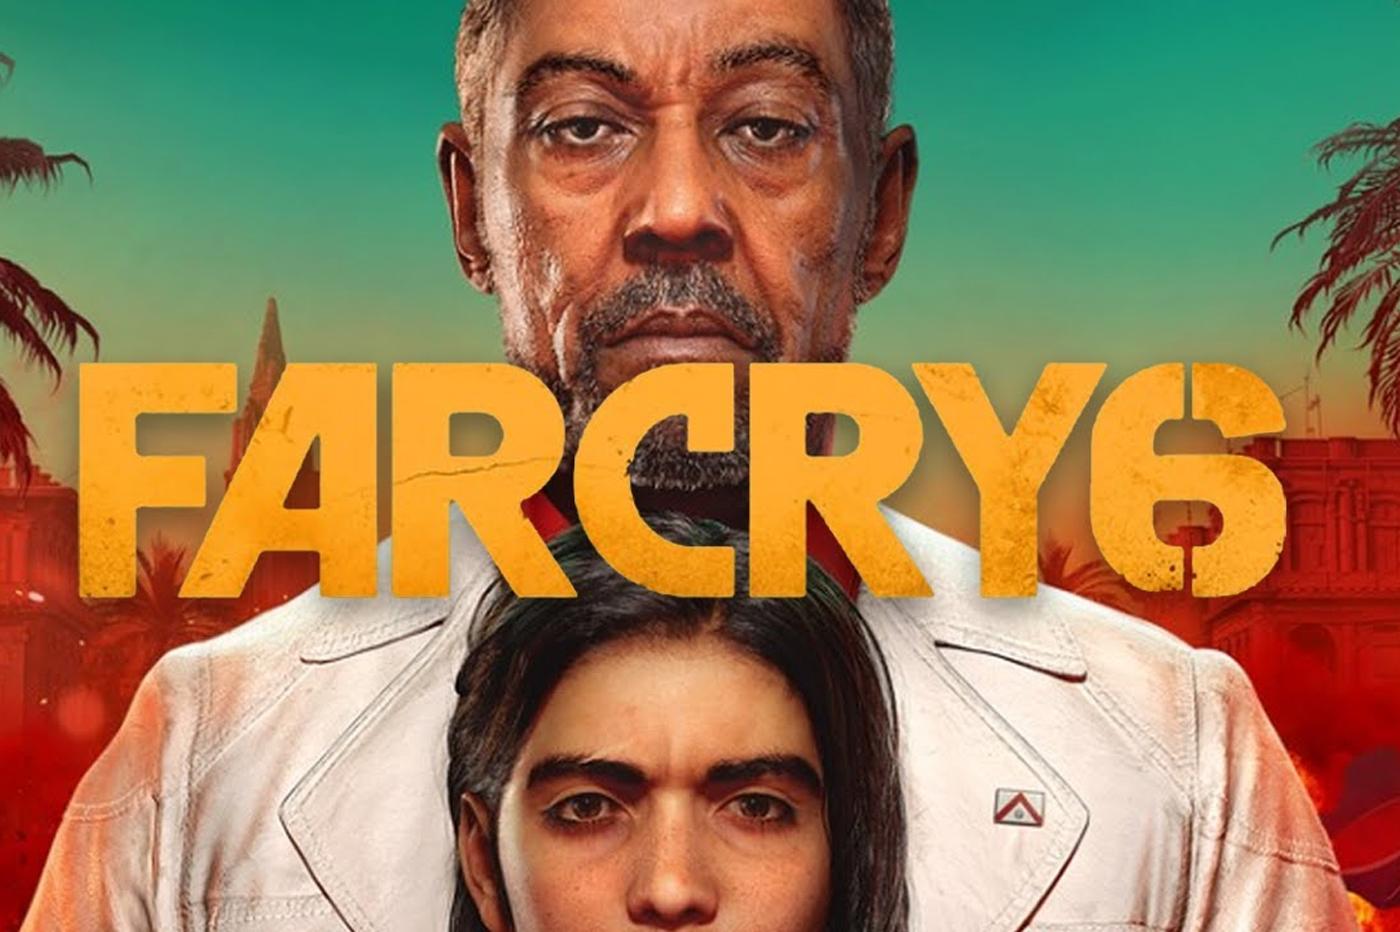 FarCry 6 Premières Informations